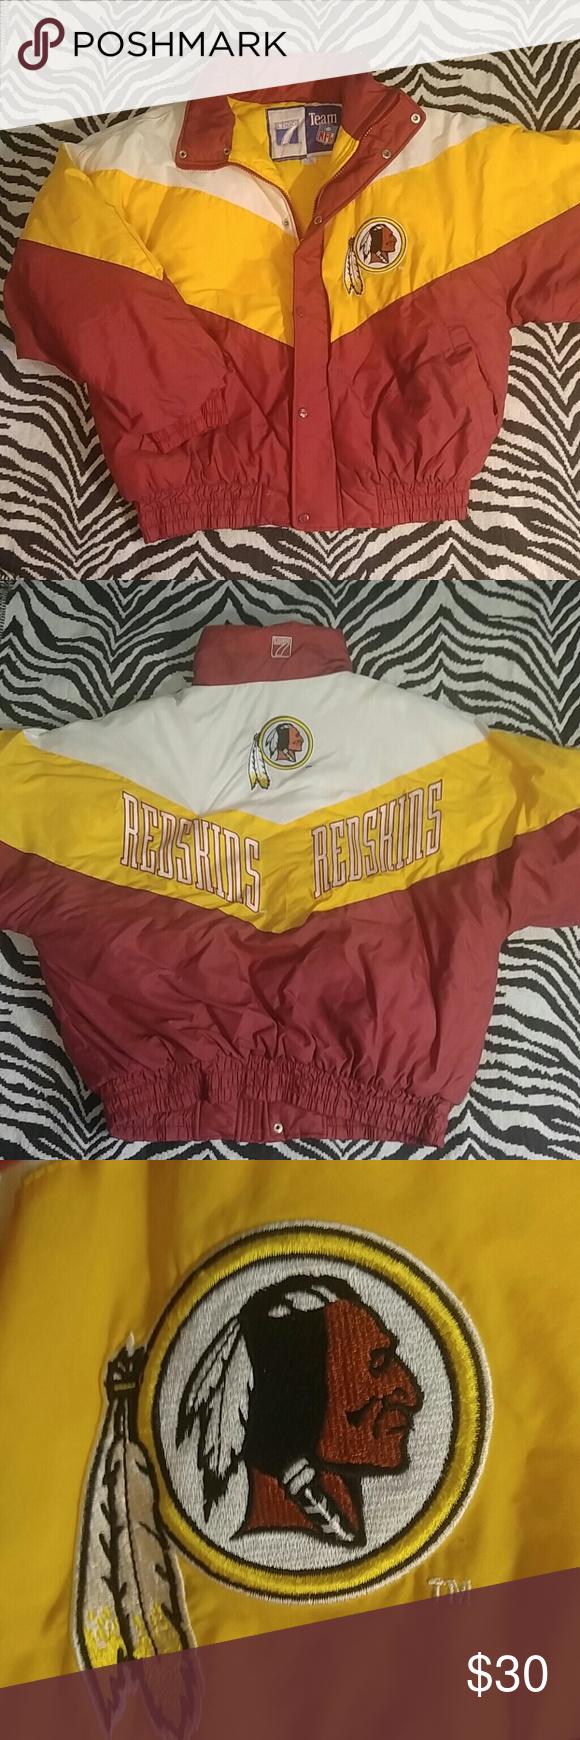 buy popular 08a1b 36c6b Vintage Washington Redskins puffy jacket XL Super rare and ...